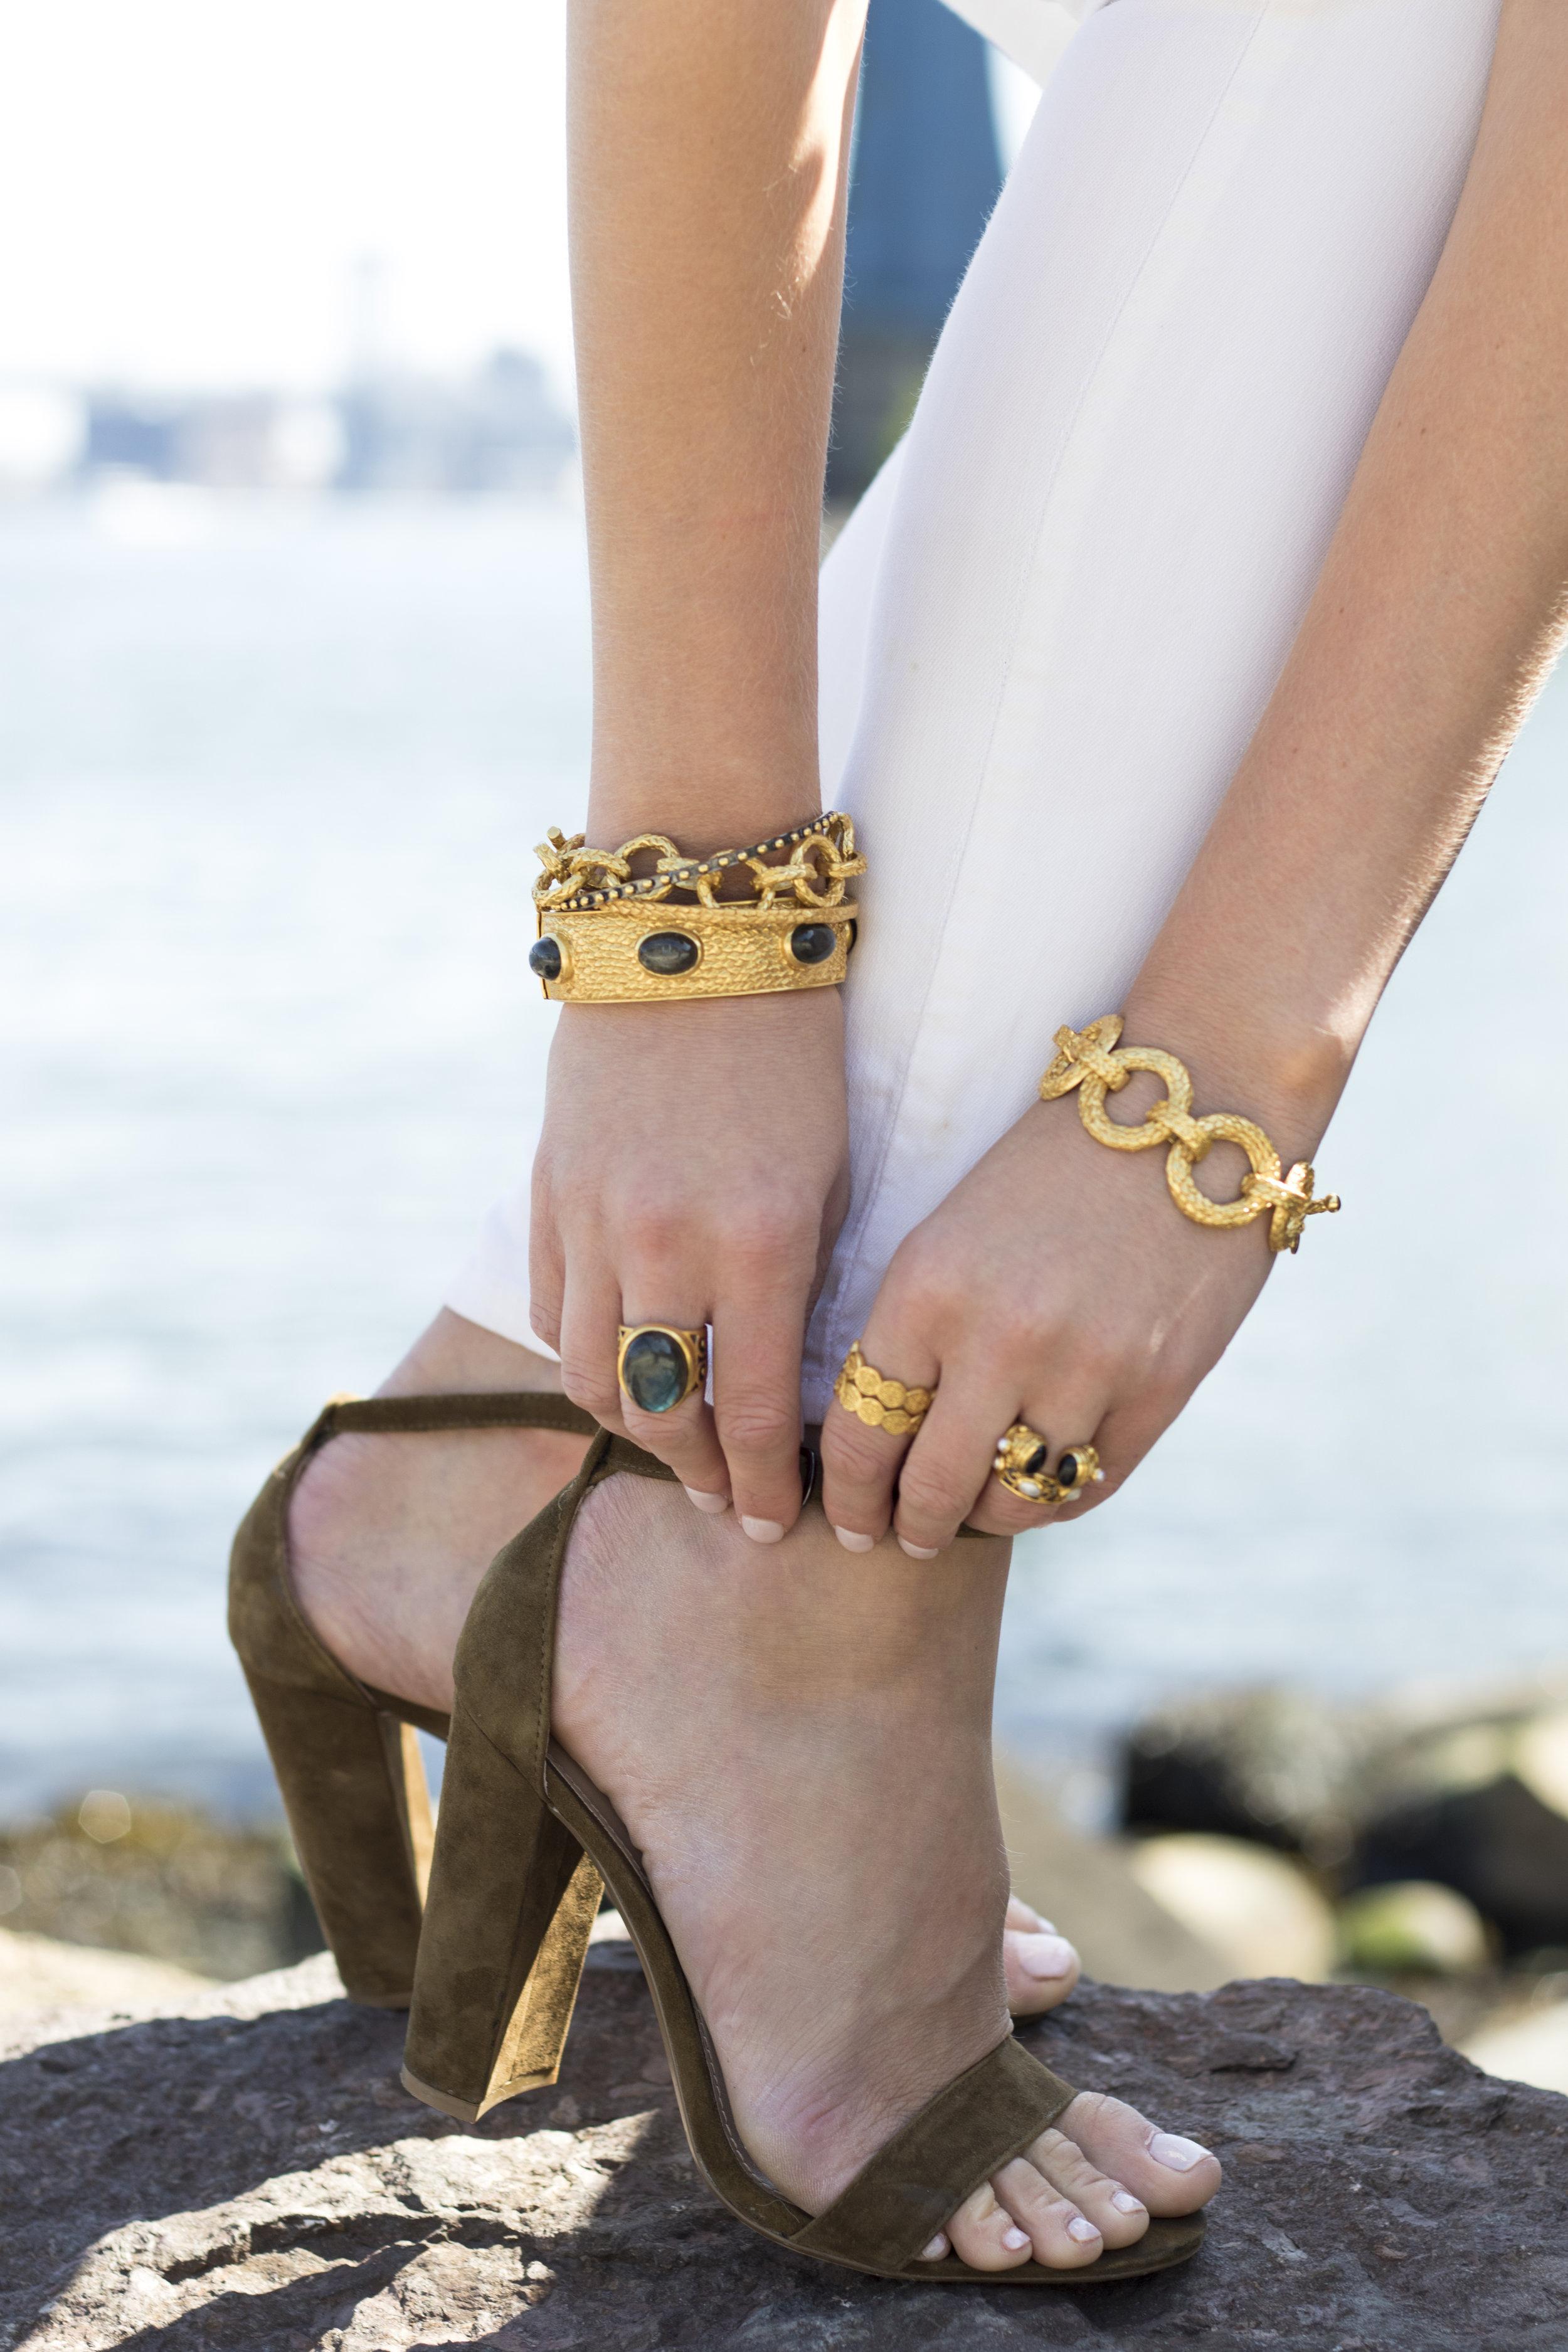 new york city jewelry photographer samantha metell.jpg